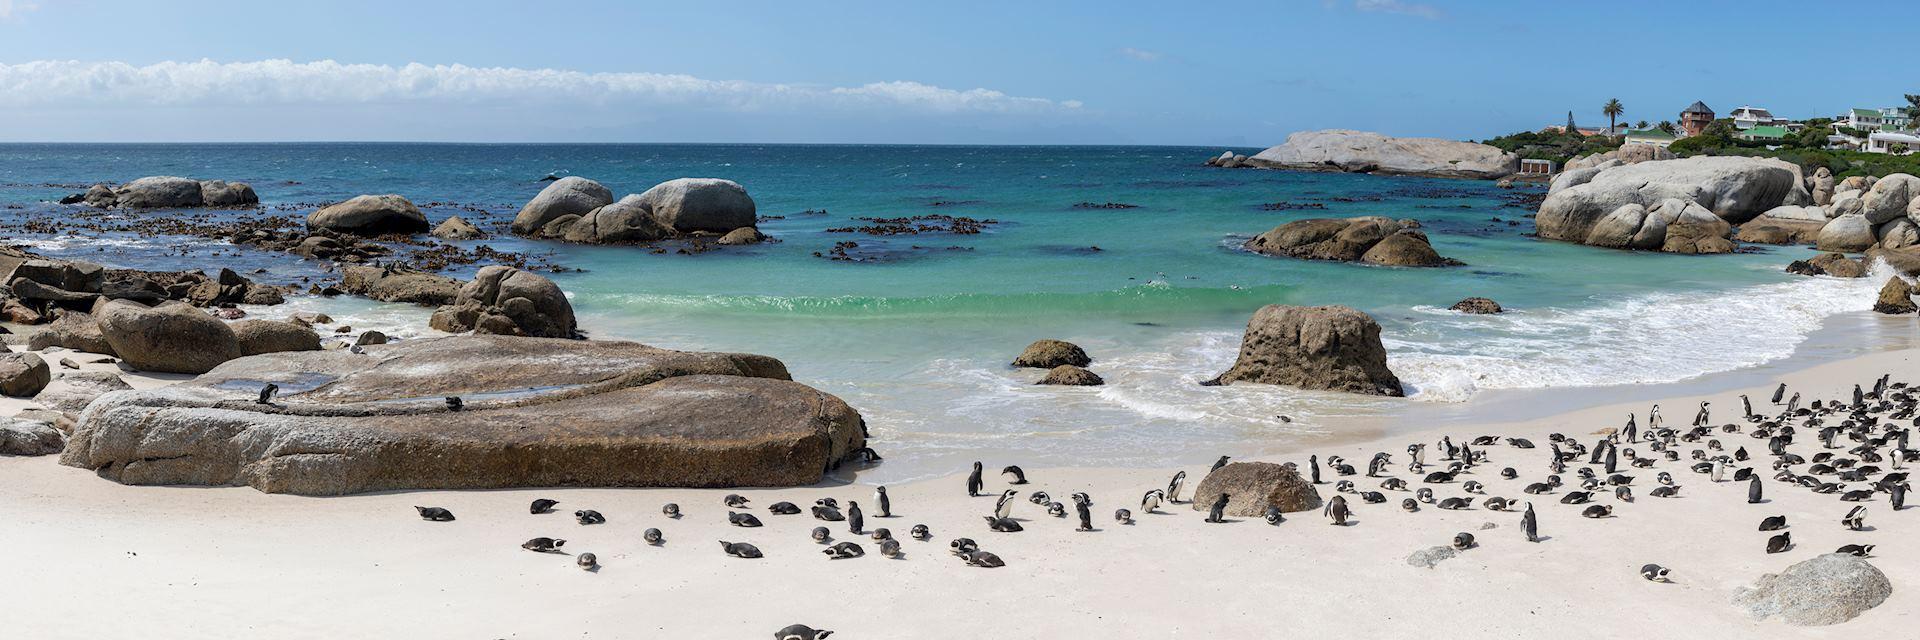 Penguins on Boulder Beach near Cape Town